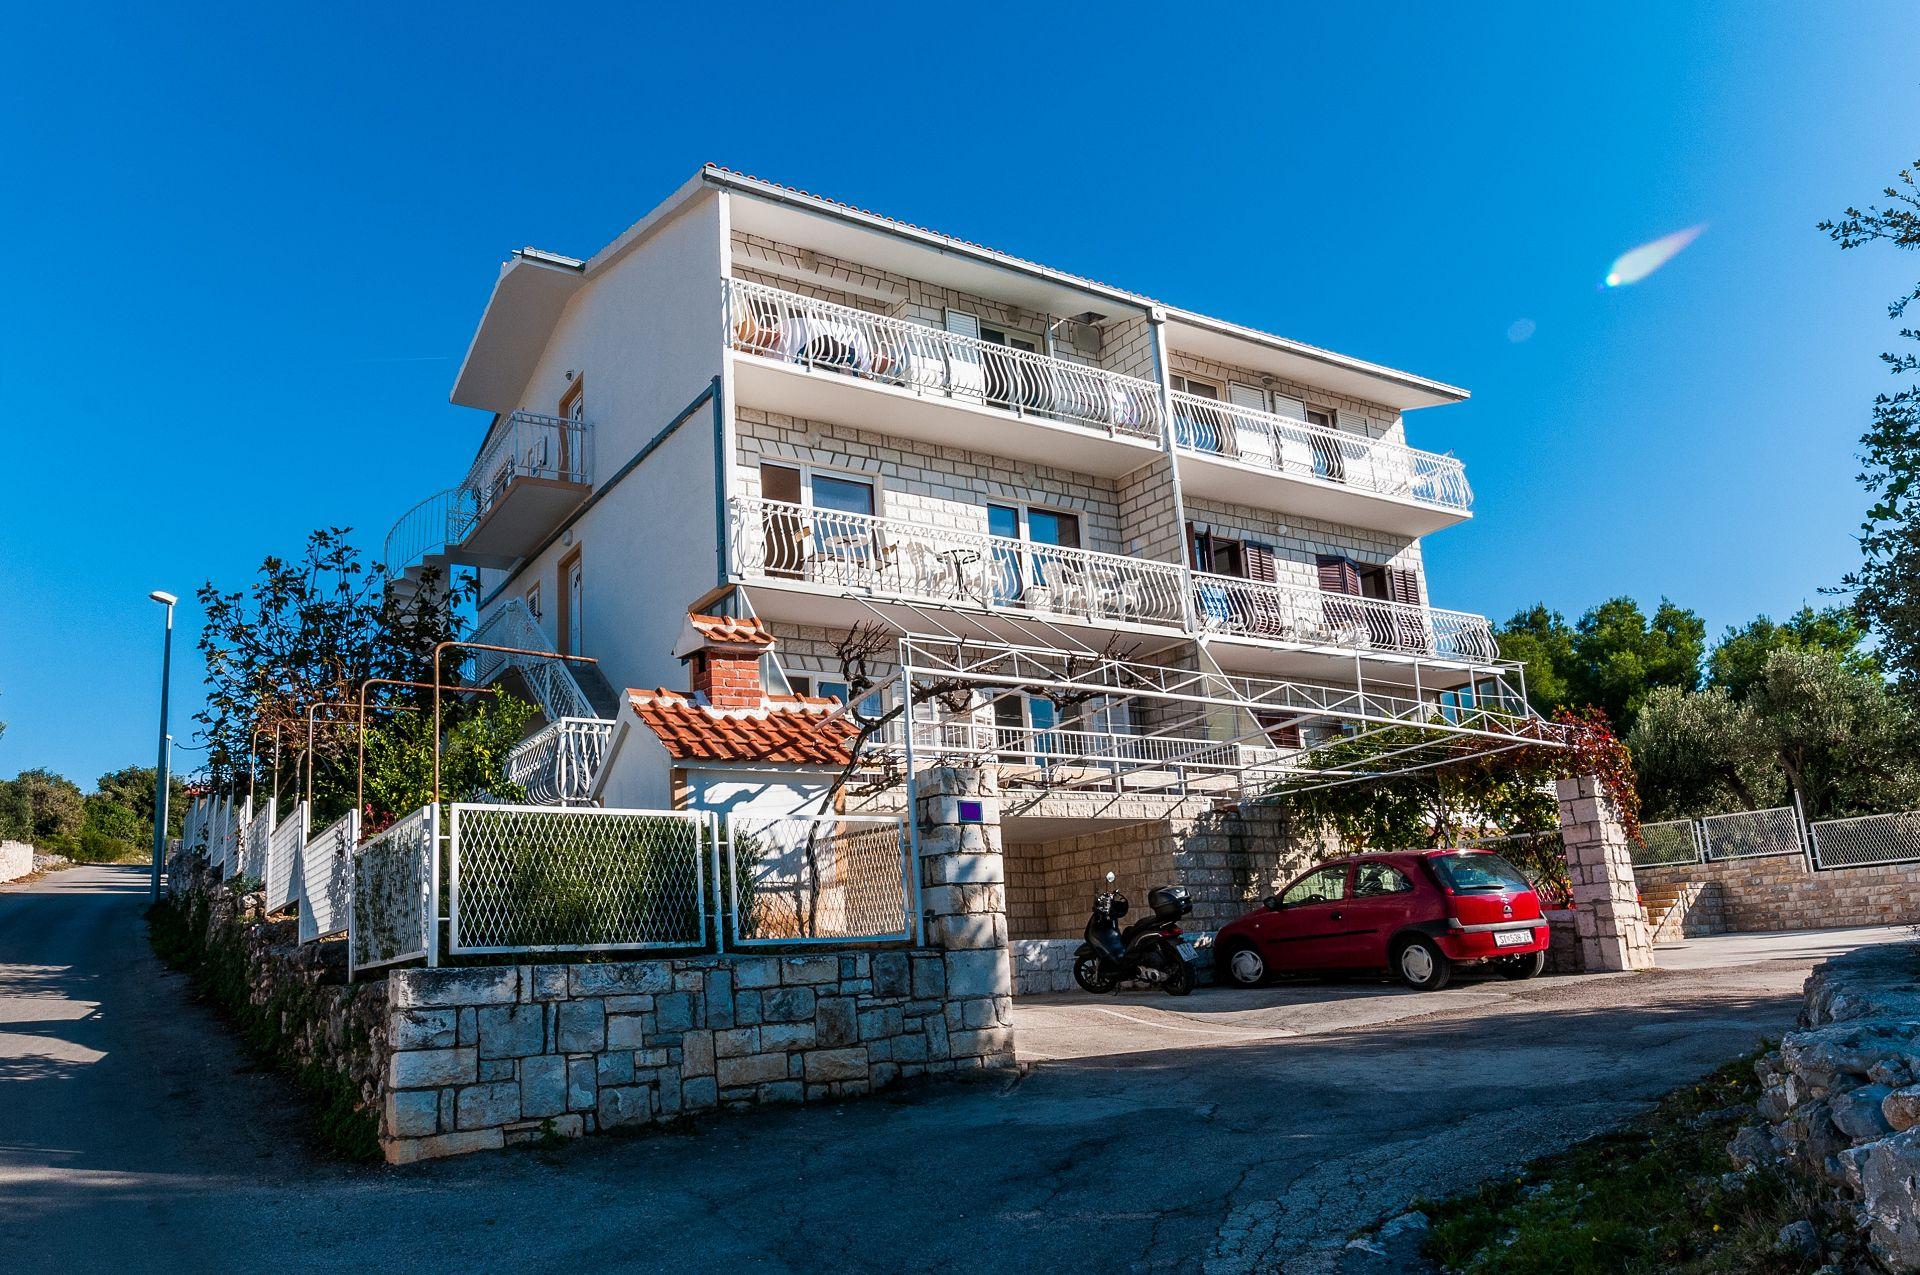 Ferienwohnung 01106ROGO A2(6+2) - Bucht Kanica (Rogoznica) (741933), Rogoznica, , Dalmatien, Kroatien, Bild 2